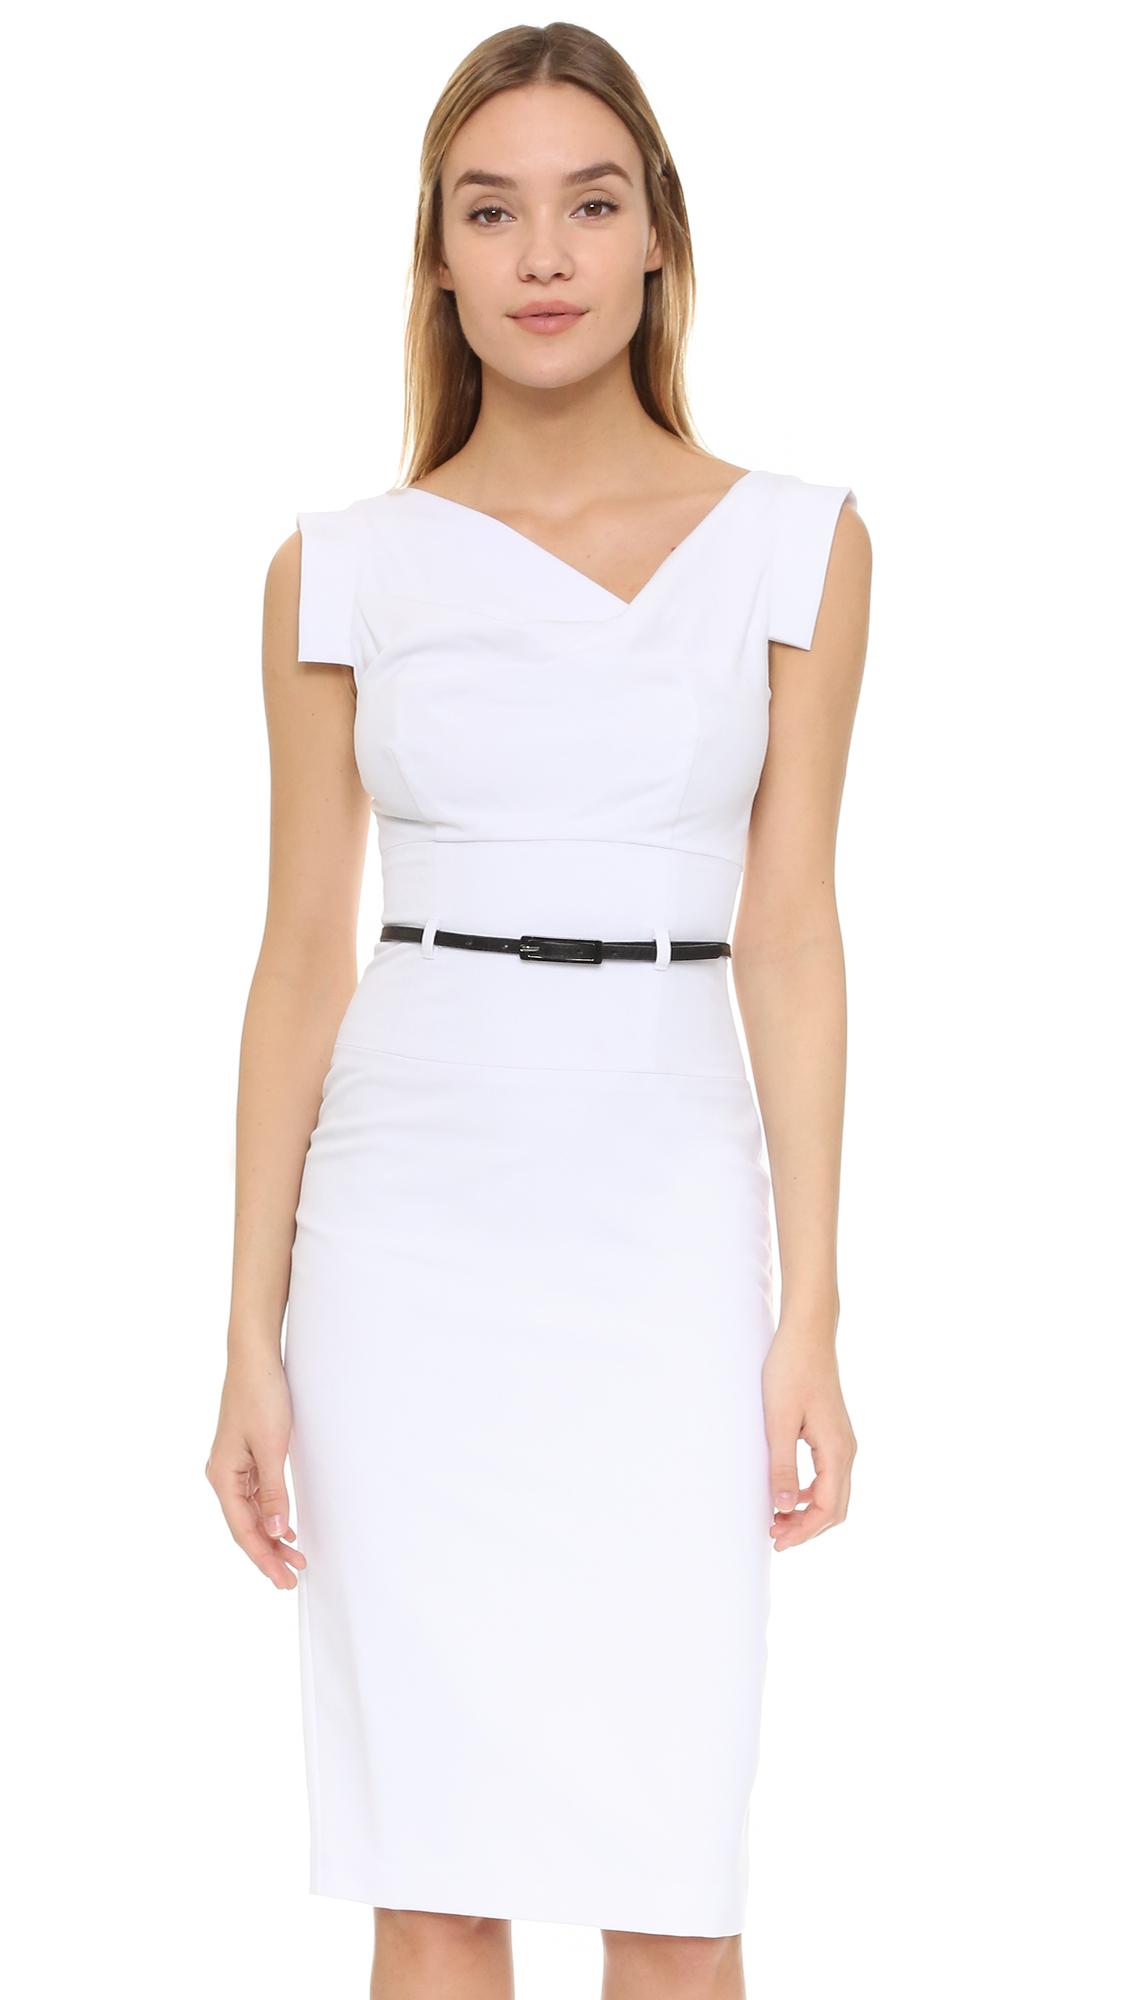 Black Halo Jackie O Belted Dress - White